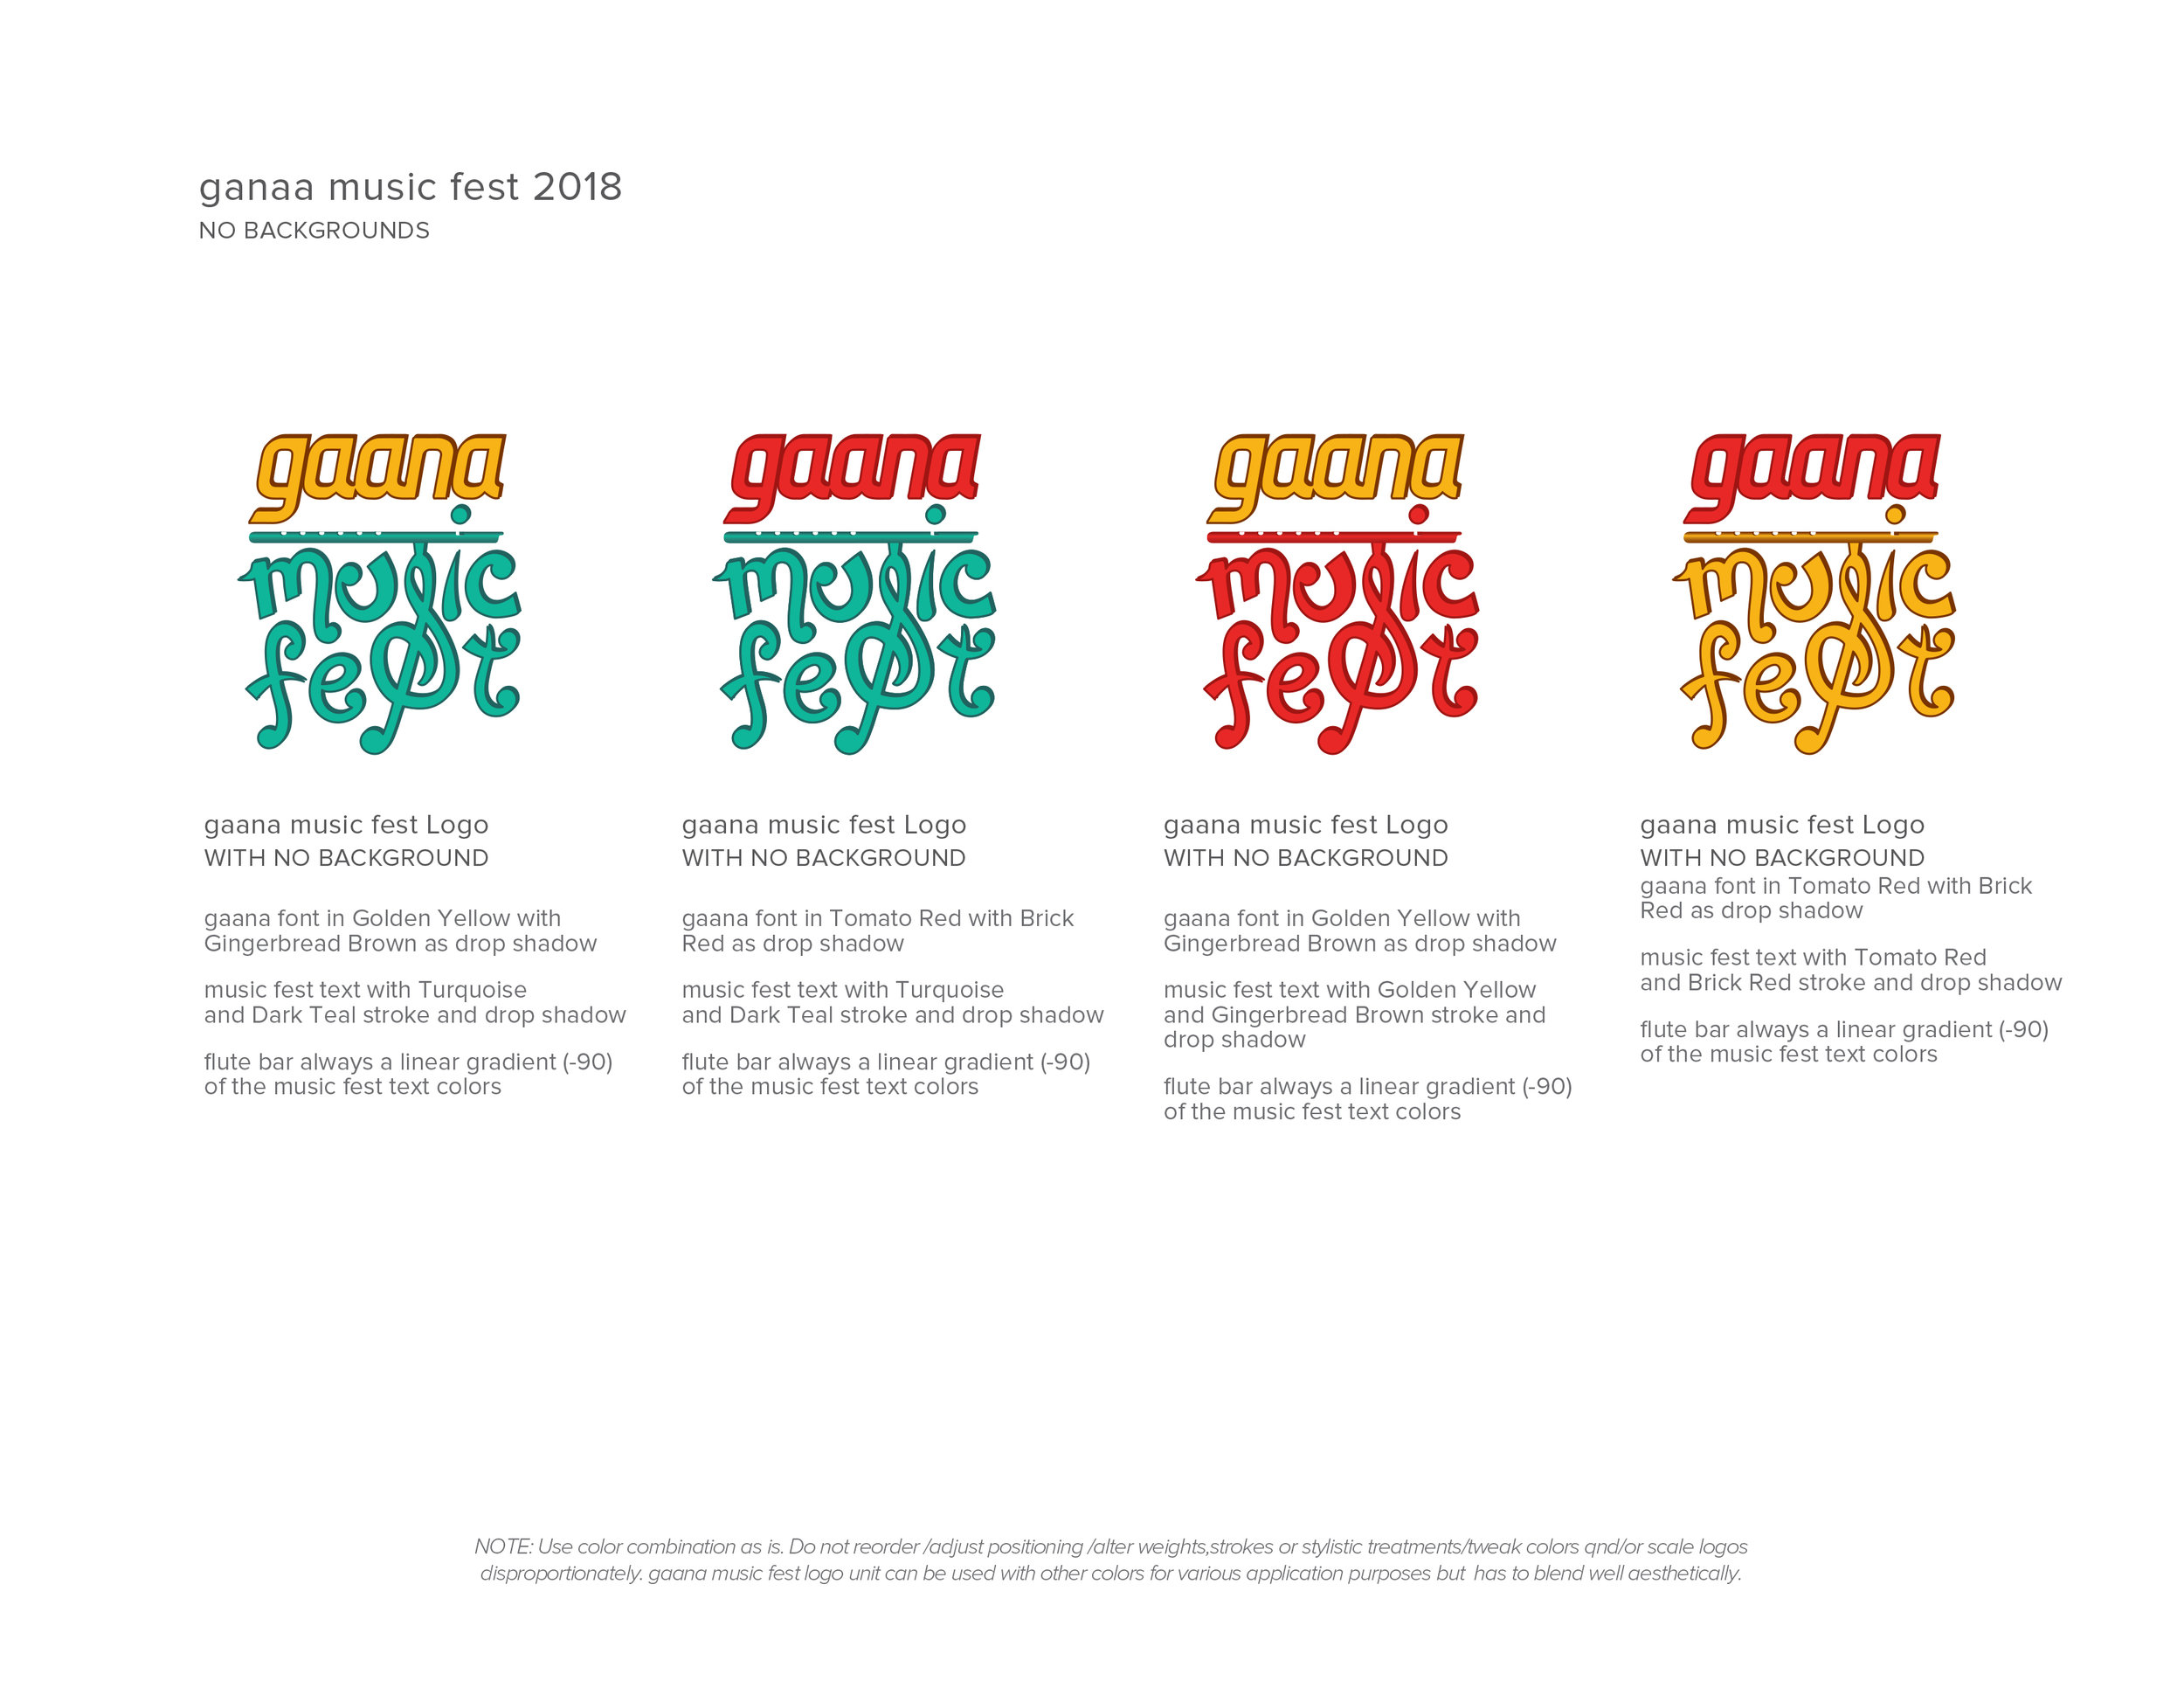 GaanaMusicFest2018_BRANDFINALs_Page_6.jpg